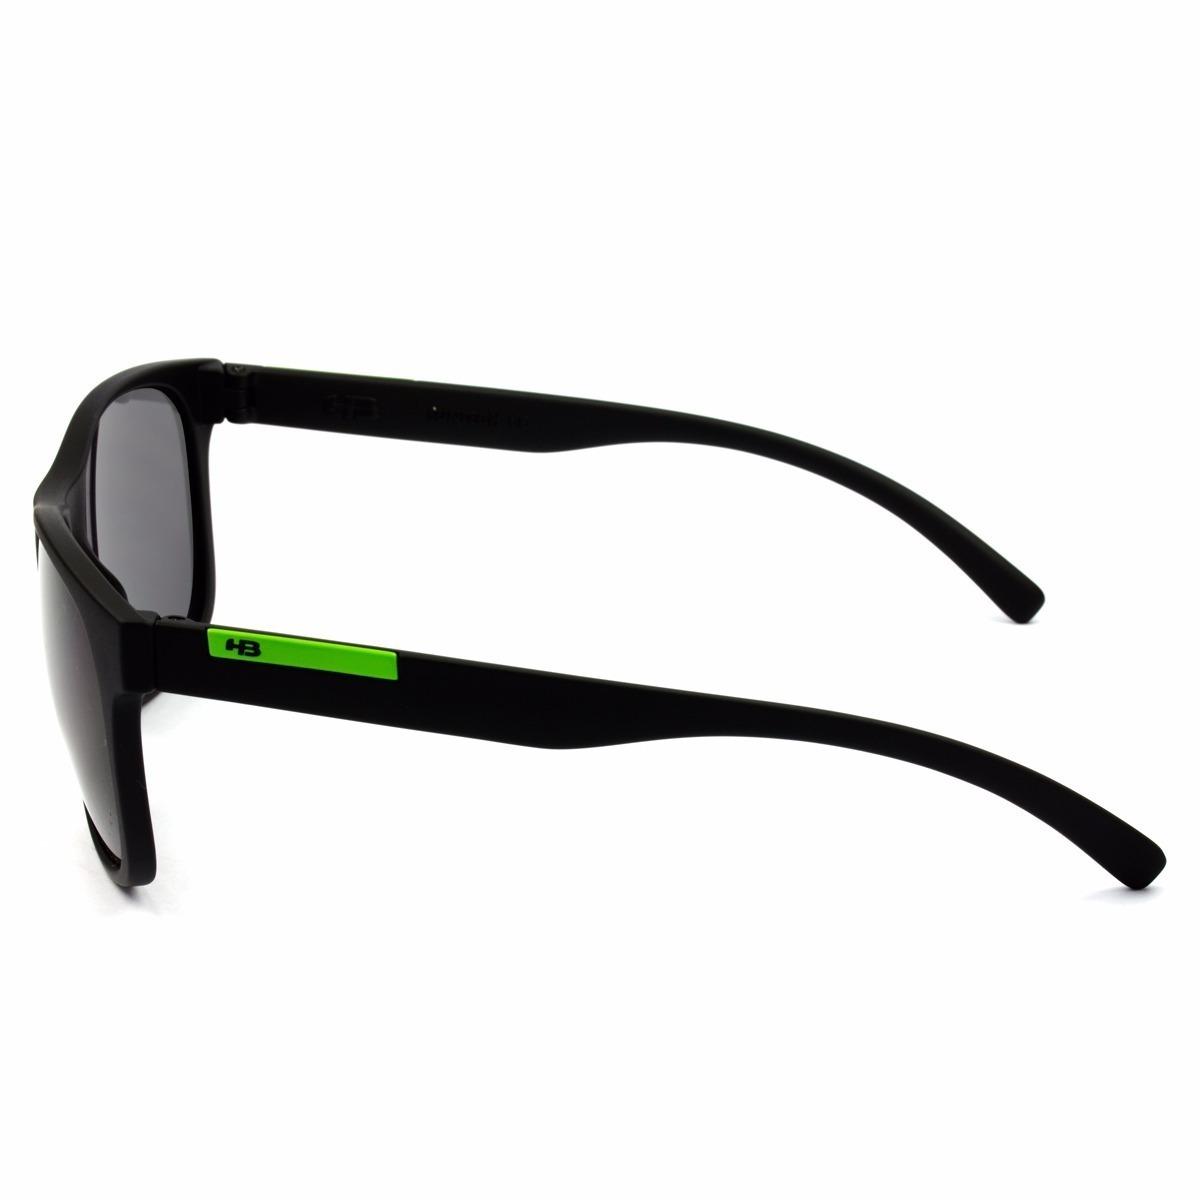 oculos sol masculino hb underground original preto verde. Carregando zoom. b6052d1b8d